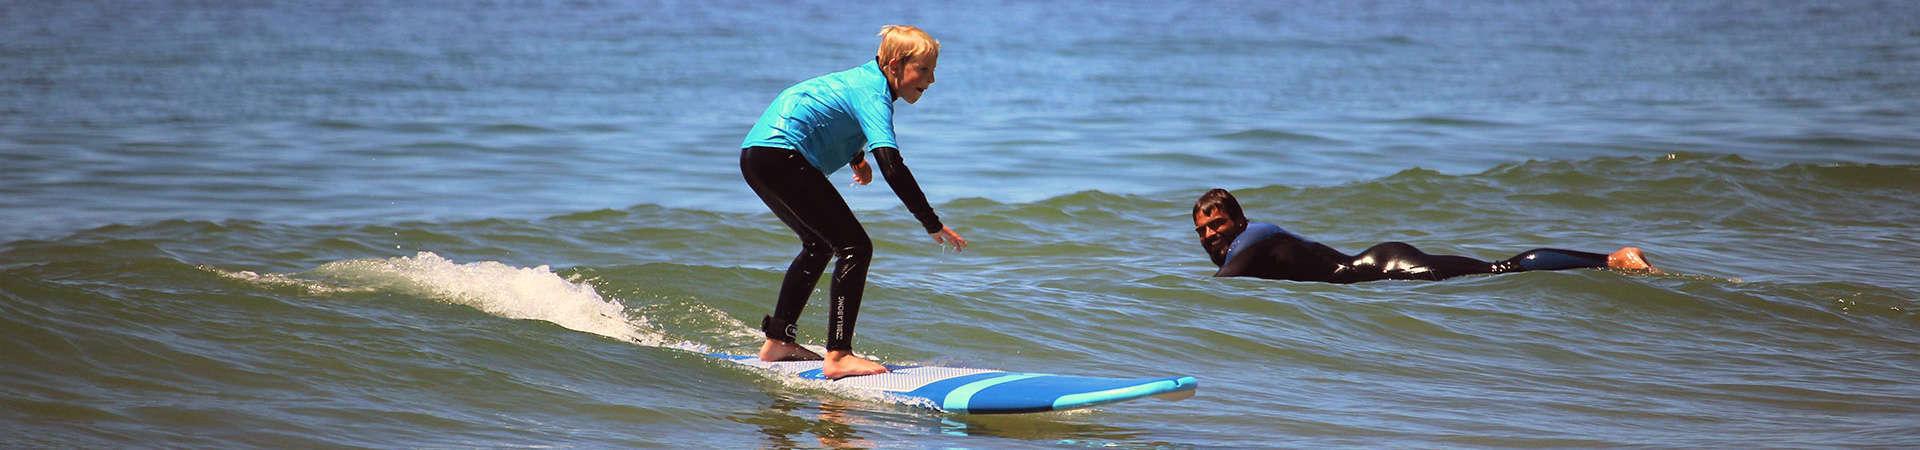 surf course beginner lisbon algarve